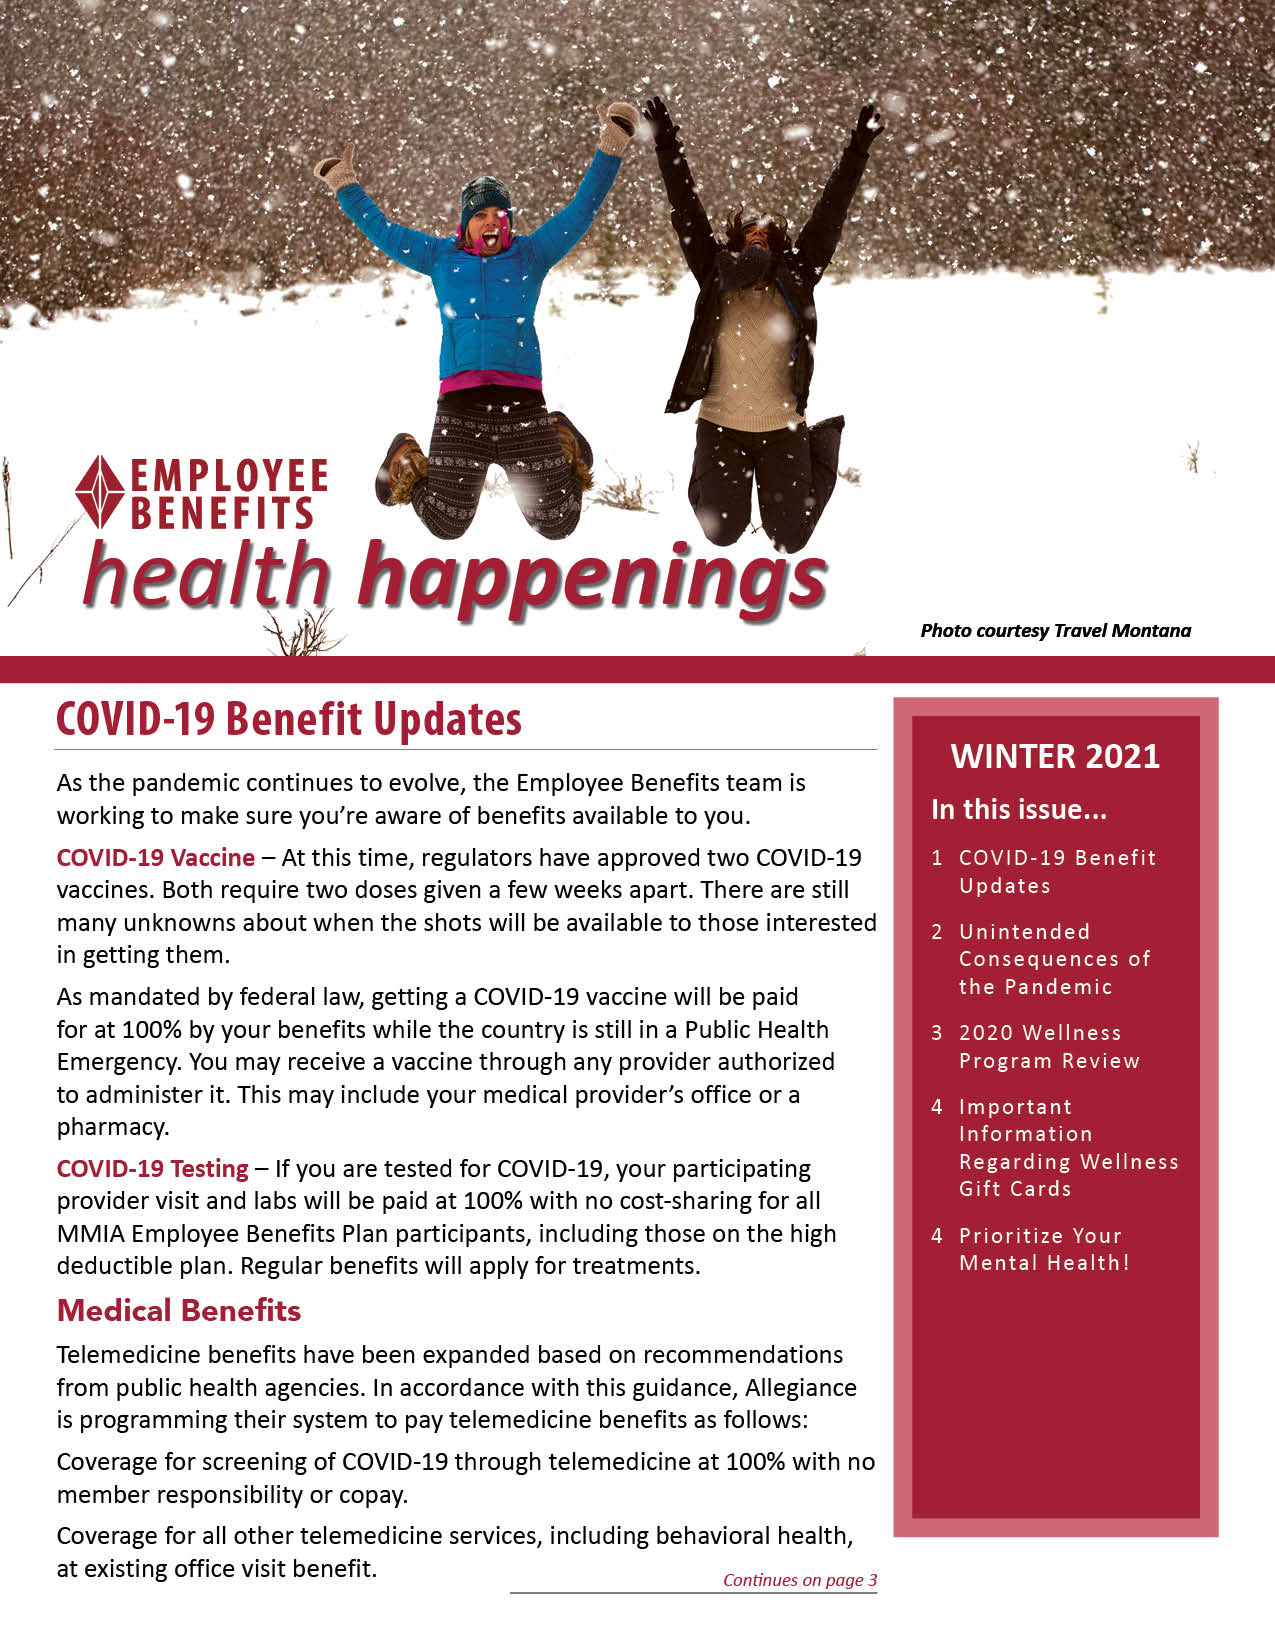 Employee Benefits Health Happenings newsletter cover